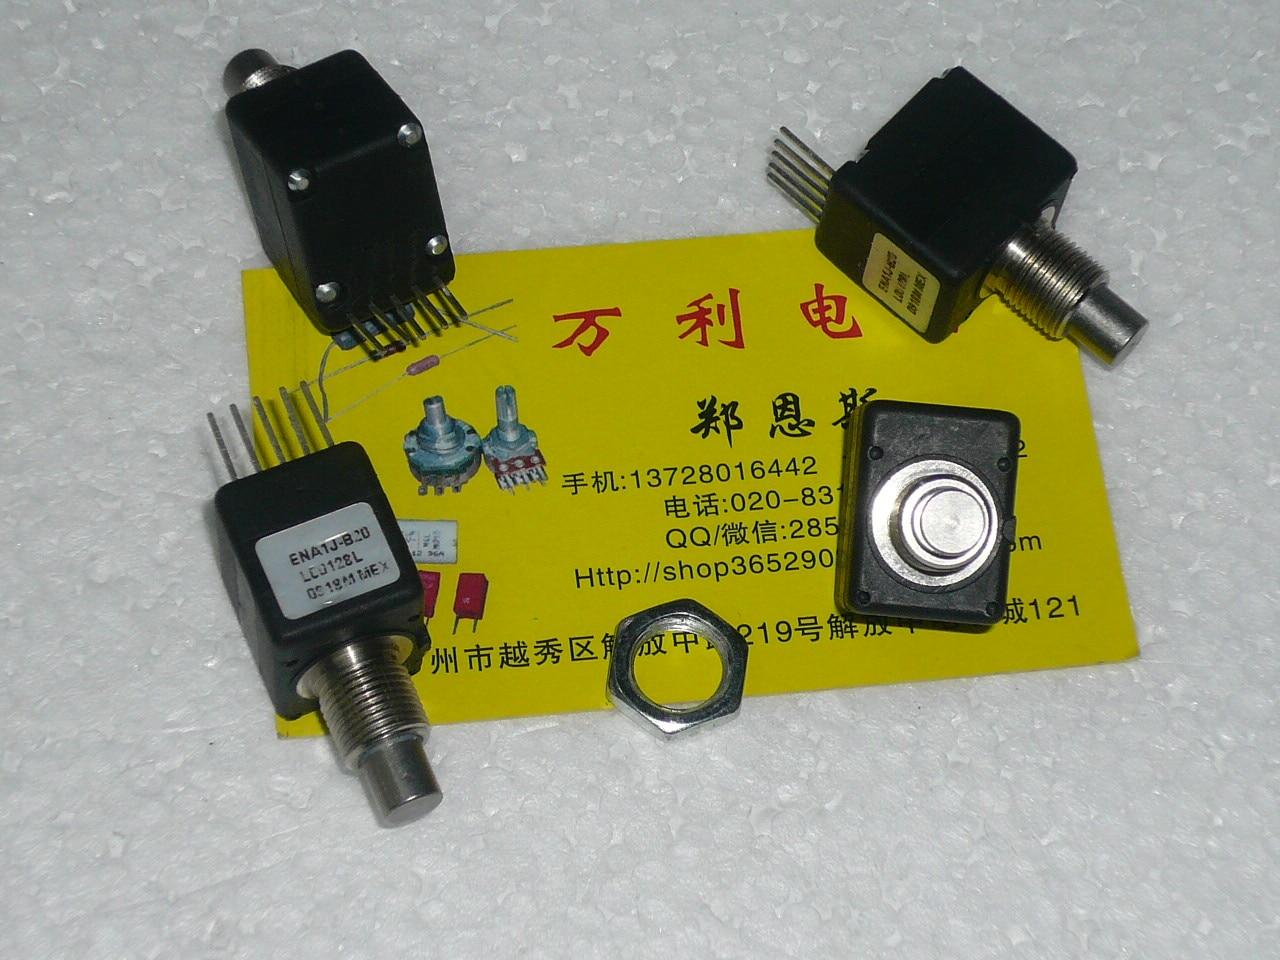 [VK] original BOURNS -A+B ENA1J-B20 L00128L 0918M 5 line shaft 16mm Optical Encoder switch[VK] original BOURNS -A+B ENA1J-B20 L00128L 0918M 5 line shaft 16mm Optical Encoder switch